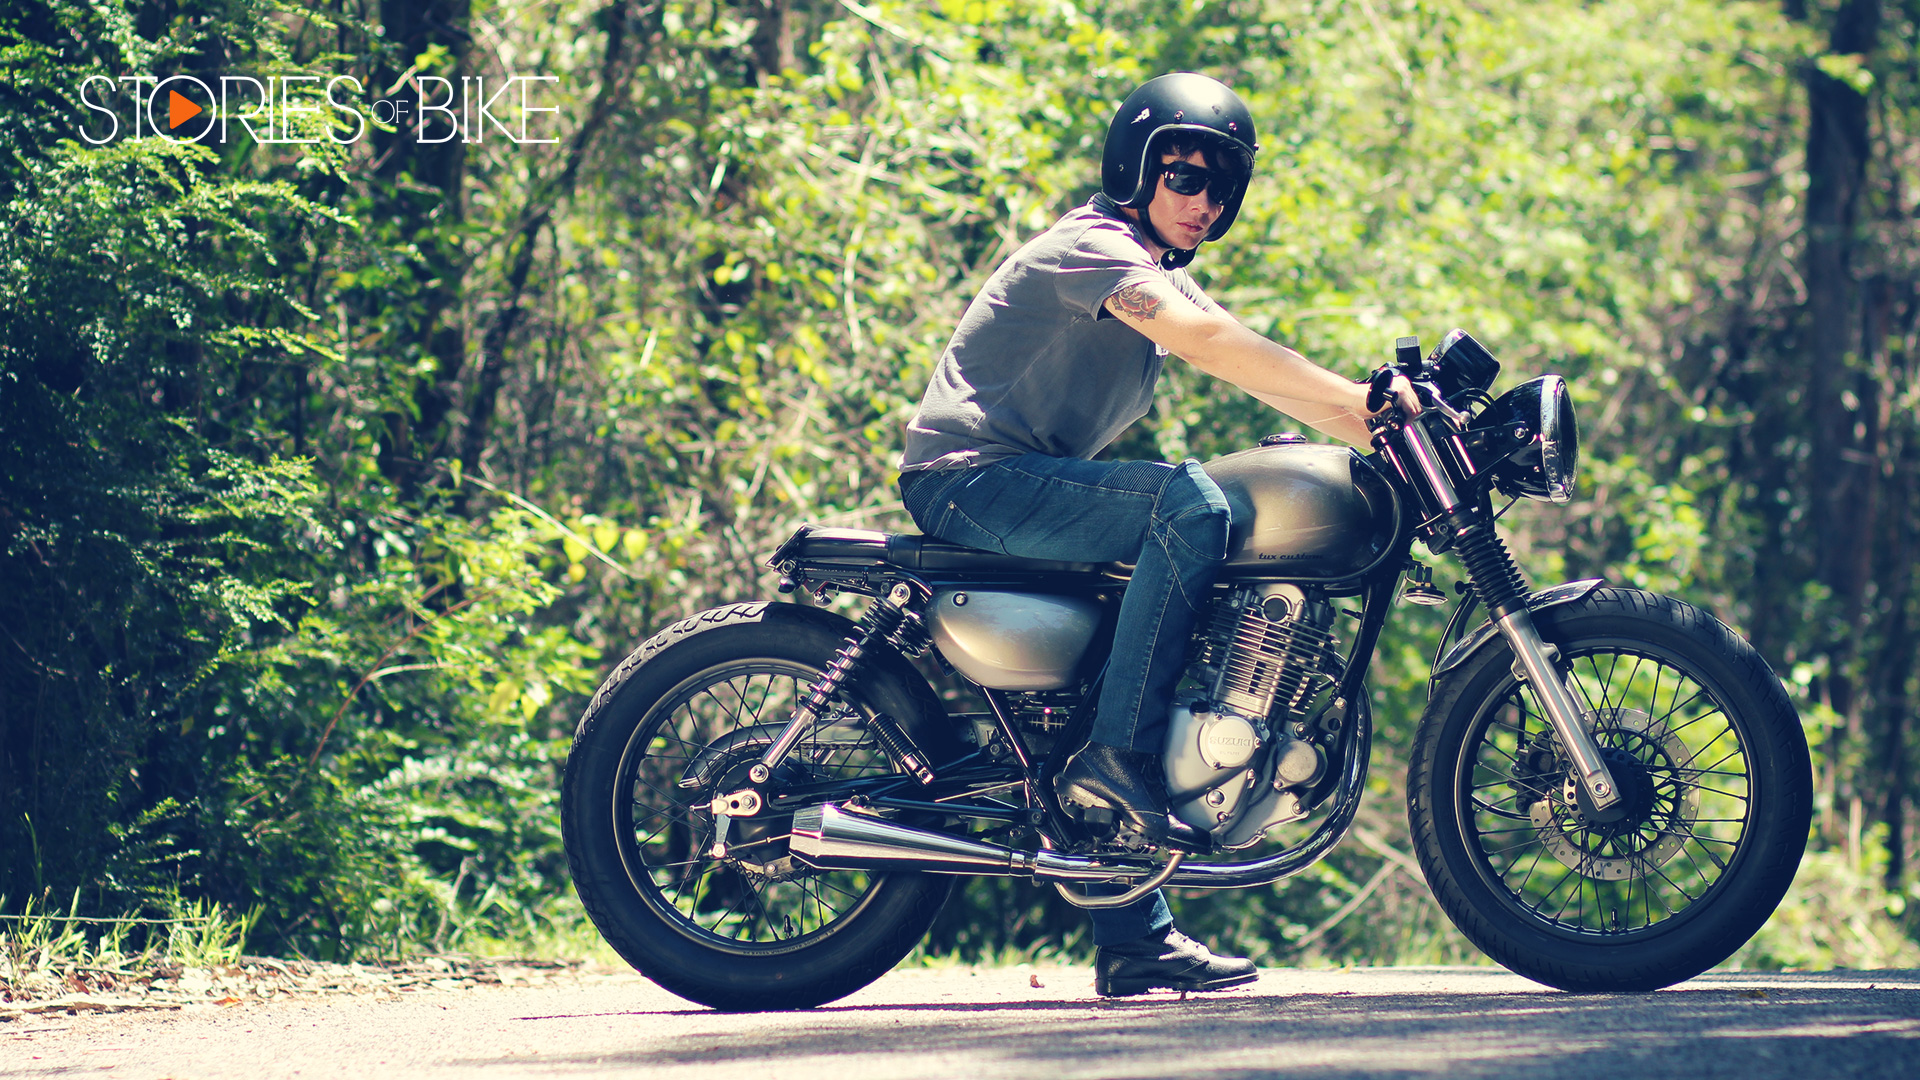 Stories_of_Bike_Ep10_1b.jpg